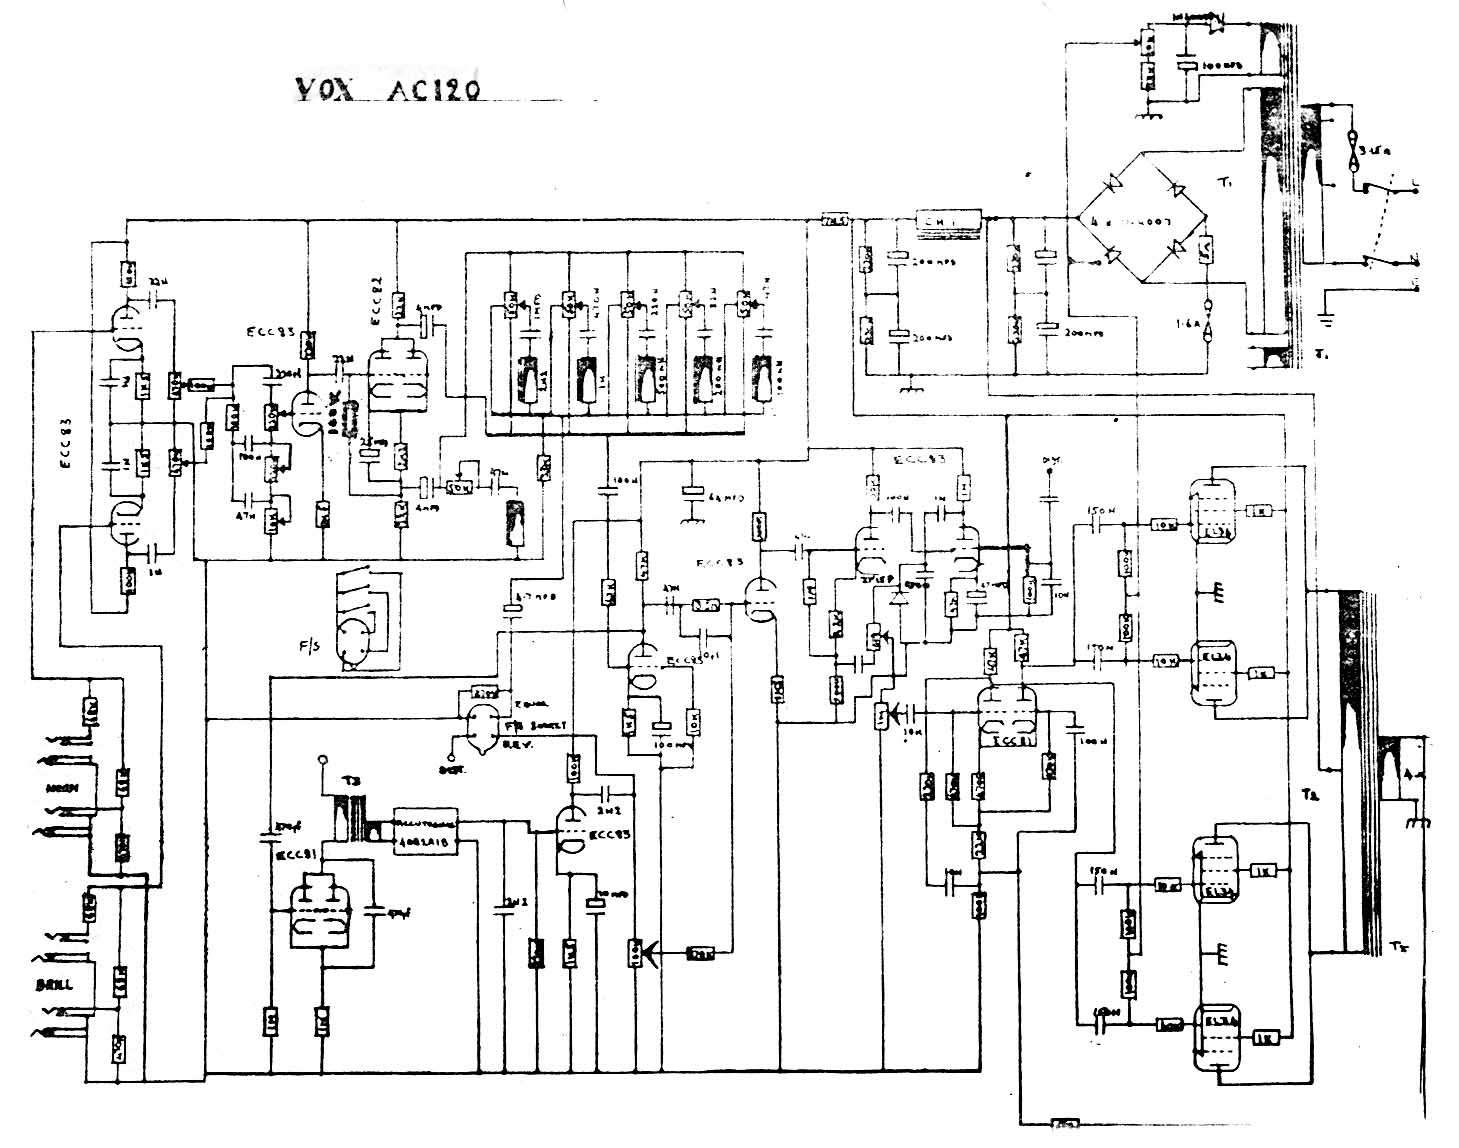 Blue Guitar Schematics on vox tube amp mods, vox tube amp schematics, fender bassman schematic, fender champion 600 schematic, fender deluxe reverb schematic, vox ac15 layout, audio amplifier schematic, ac30 schematic, vox v9158 15r, vox vt50 amp schematics, vox vt 50 amps, vox amp diagram, blues jr schematic, vox tonelab le power cable diagram, small ice machine schematic, pcb schematic,